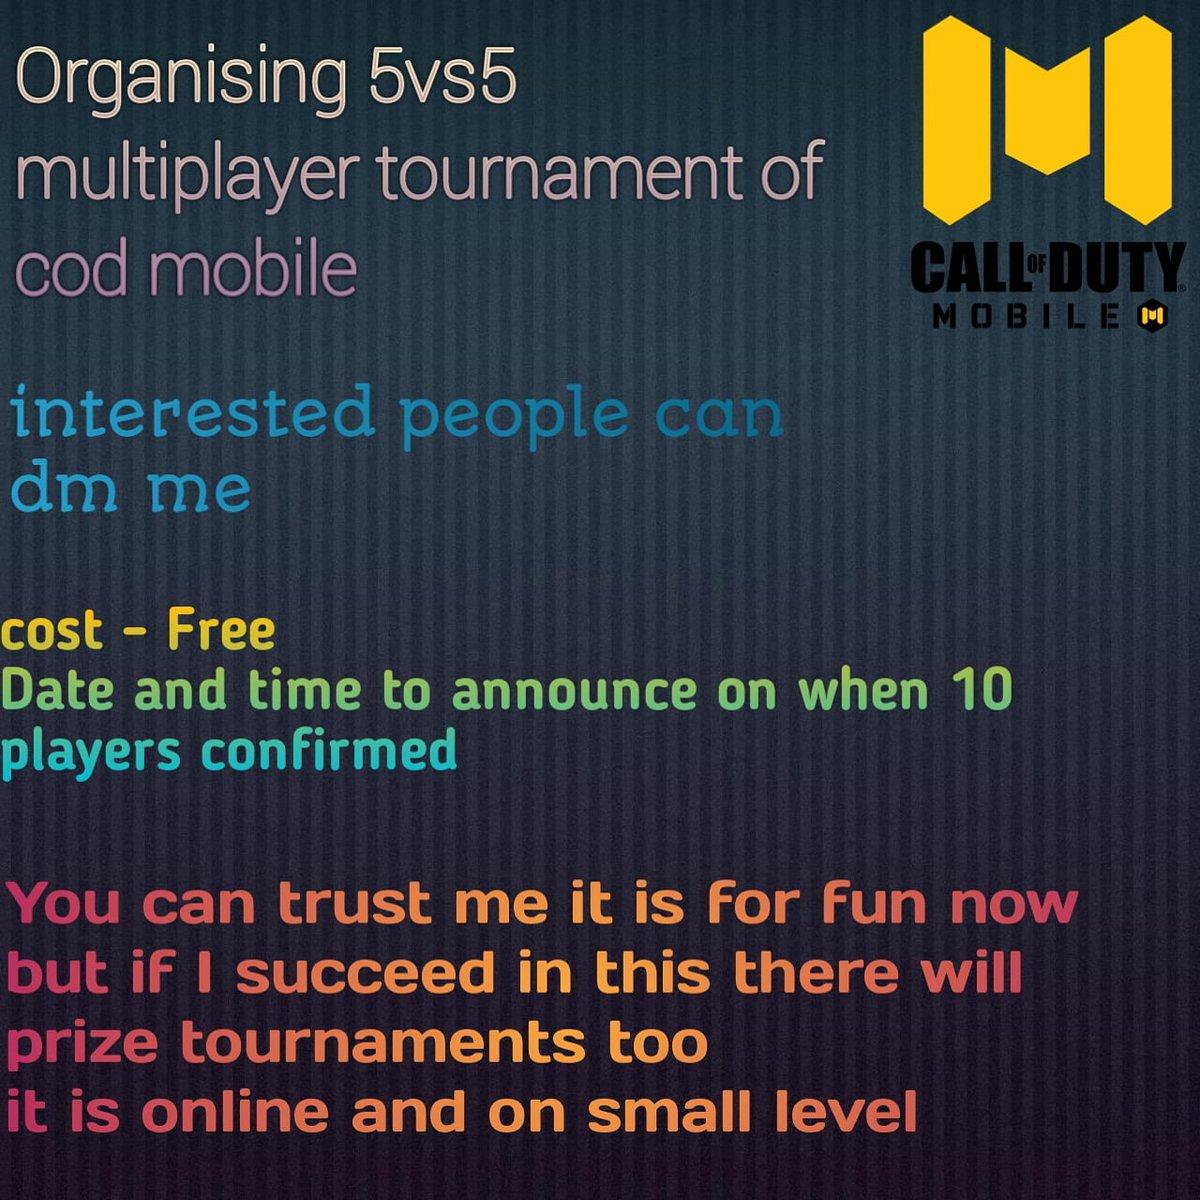 My first esl online match #CallofDuty #CallOfDutyMobile #esport @ESL @UjjwalGamer @CallofDuty @CoDMobileClips @ESLPUBG